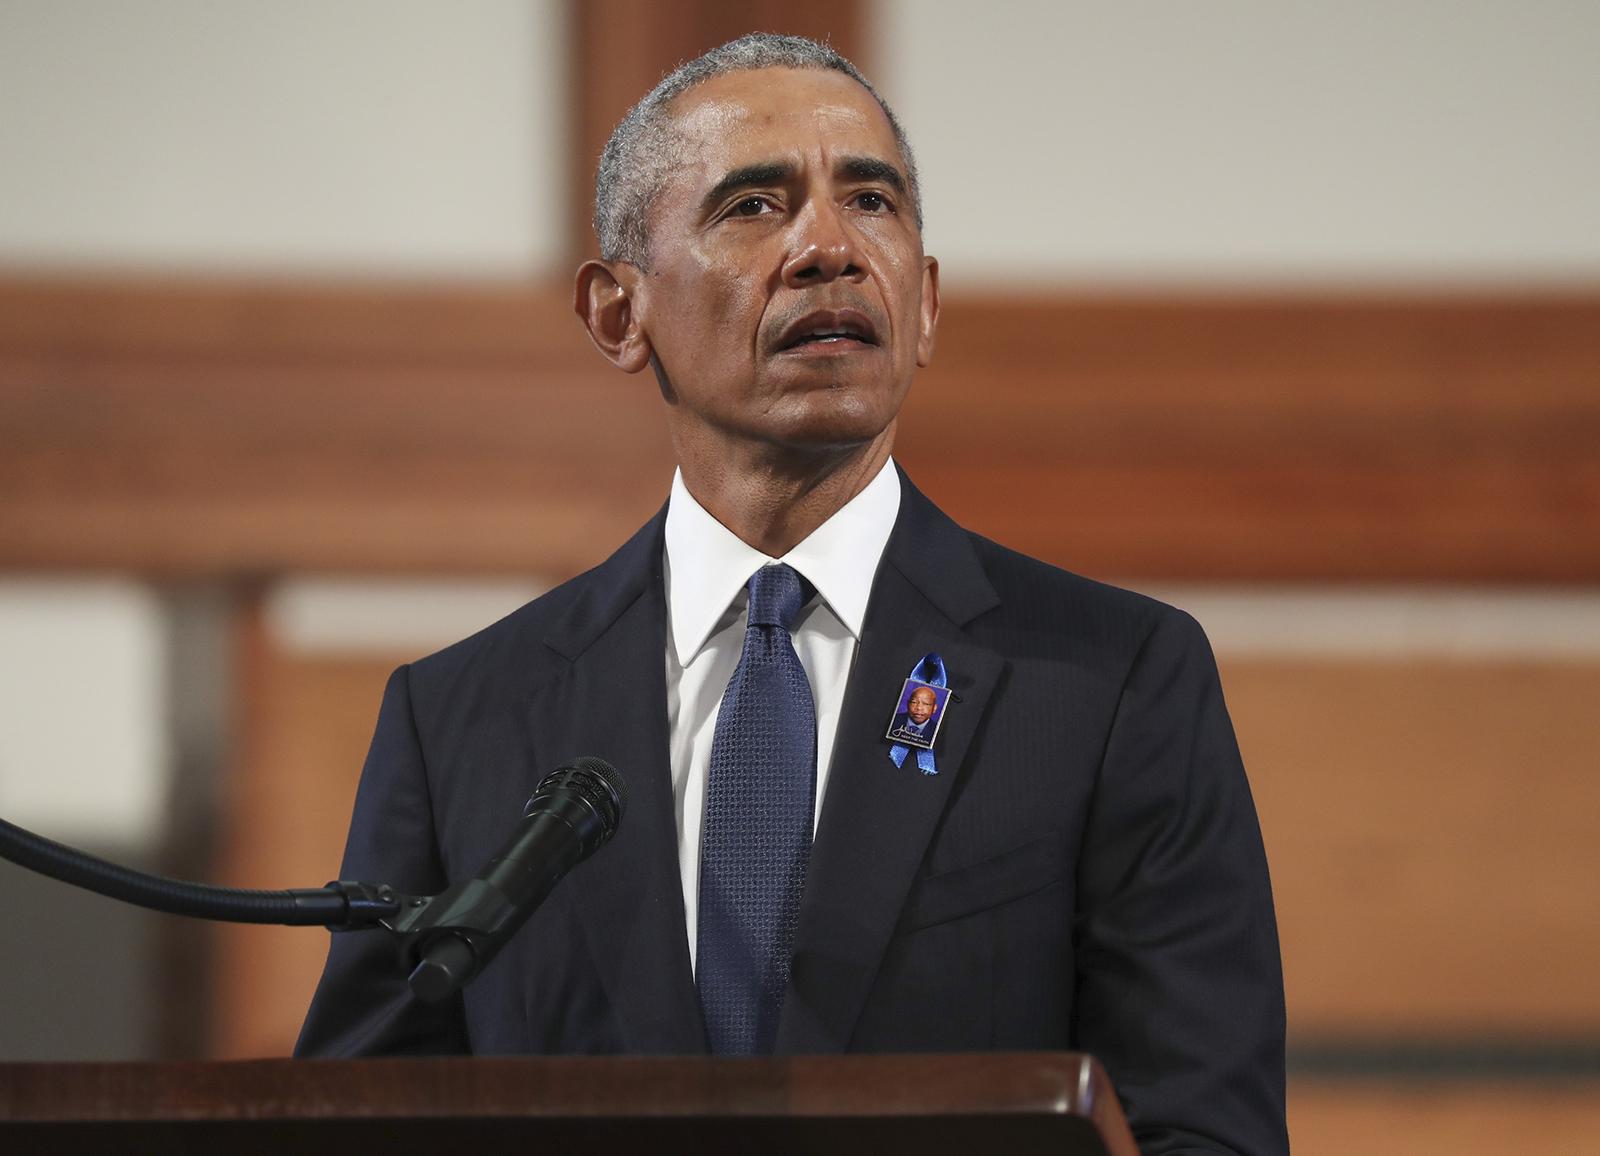 Former U.S. President Barack Obama speaks during the funeral service of the late Rep. John Lewis at Ebenezer Baptist Church on July 30, in Atlanta, Georgia.